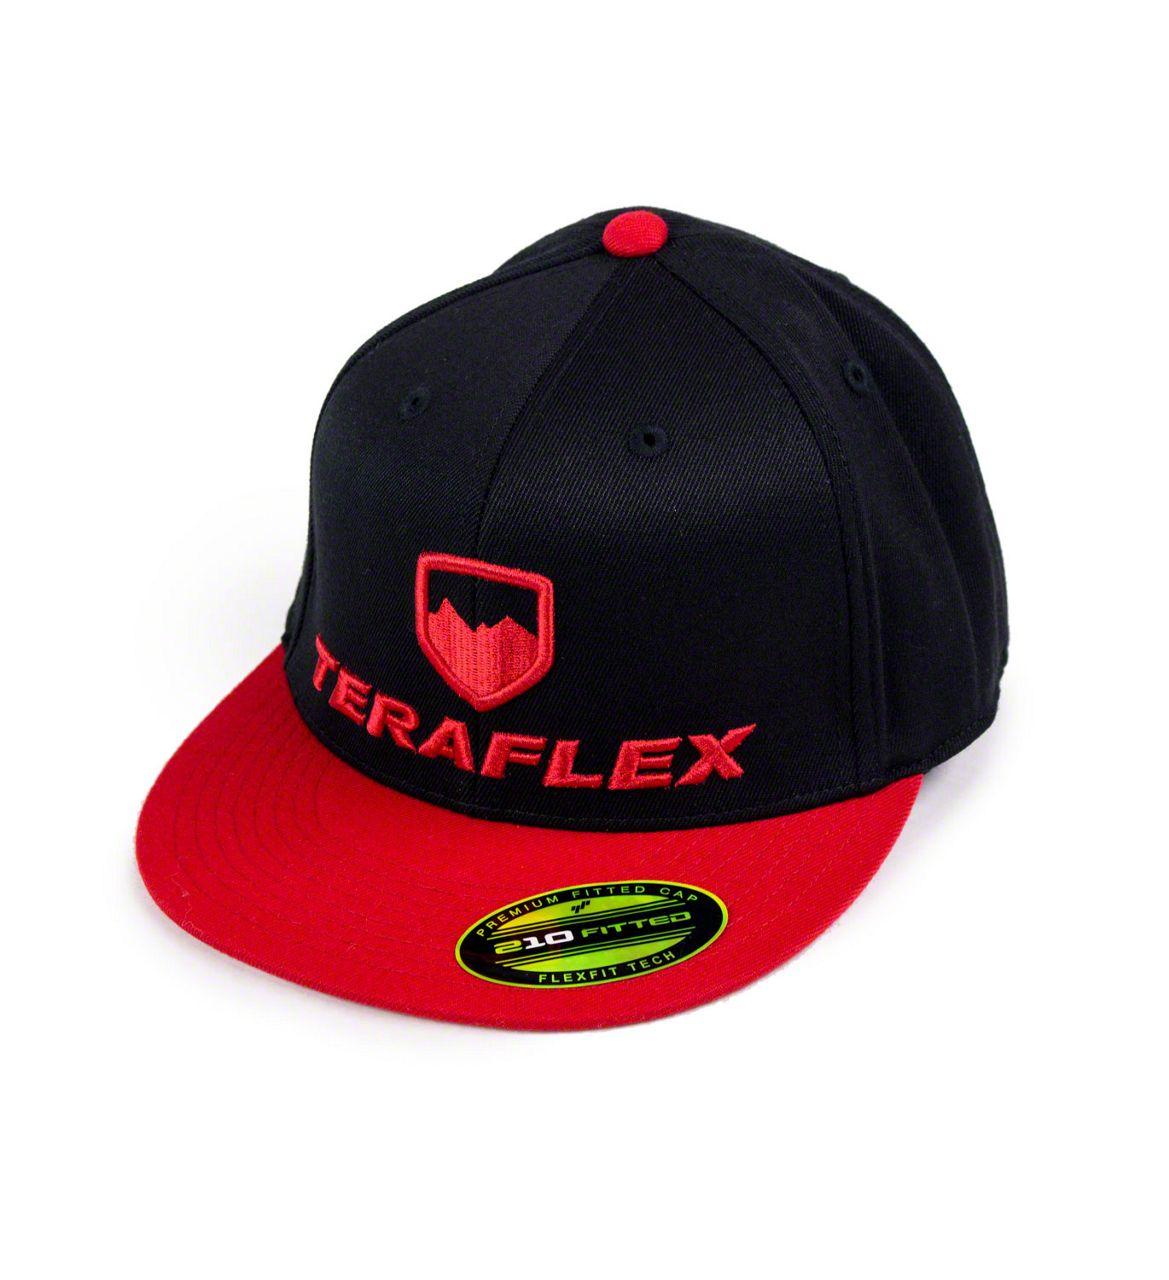 Teraflex Premium FlexFit Two Tone Flat Visor Hat - Black